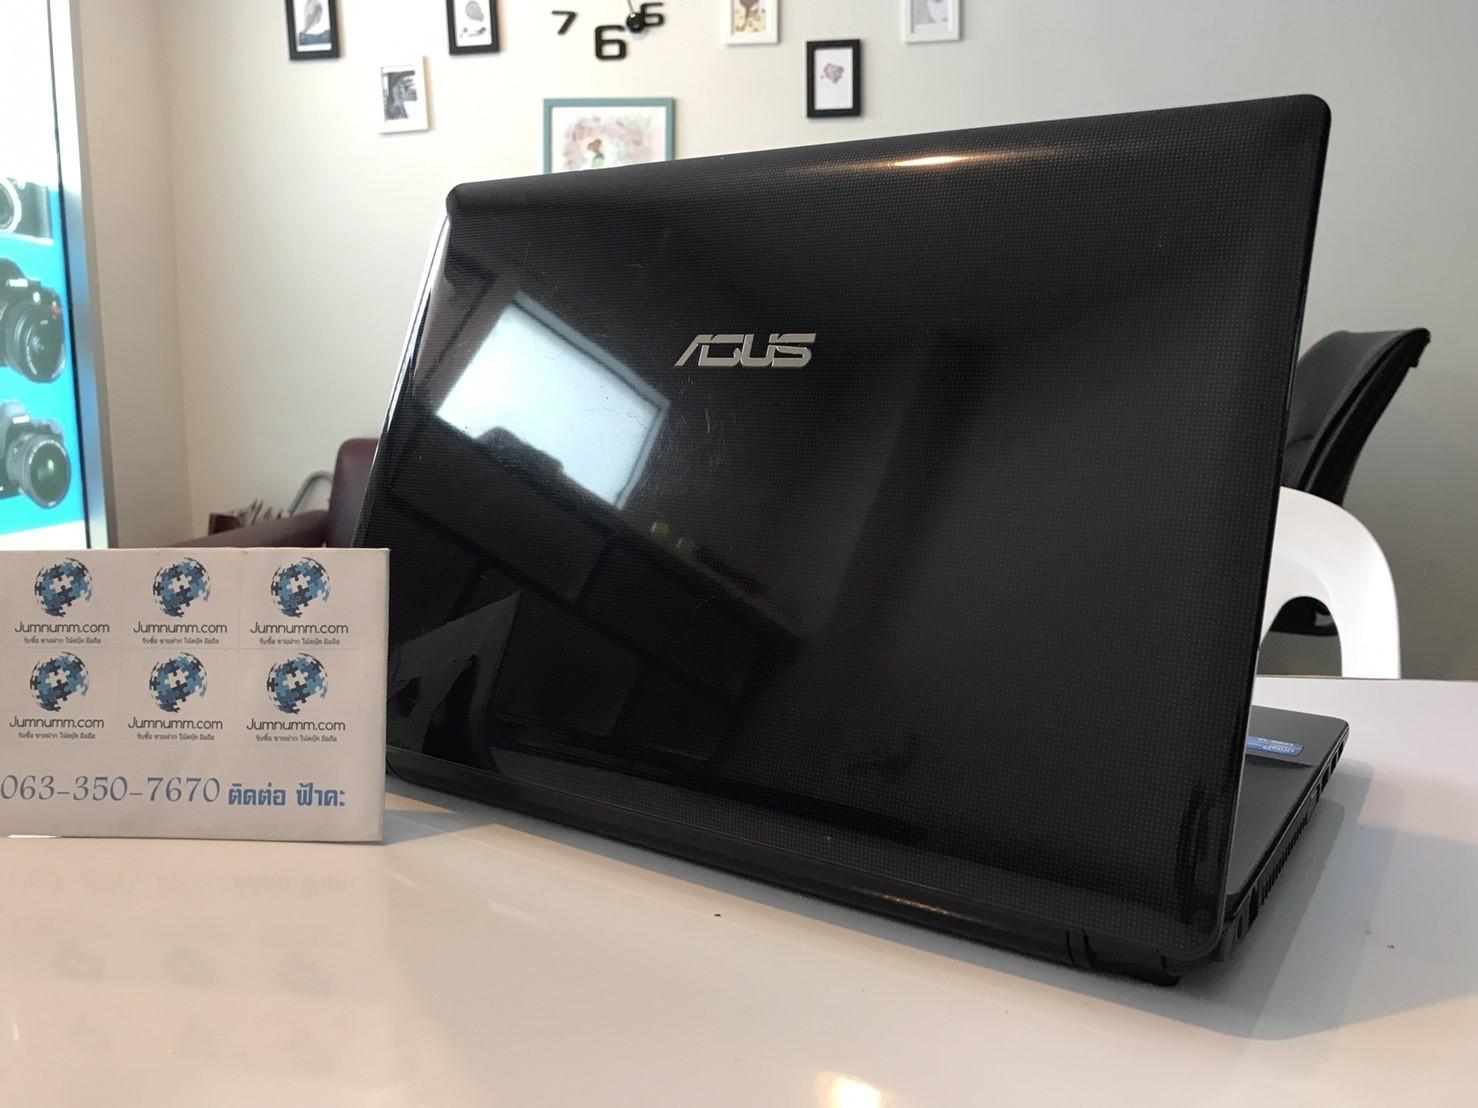 JMM-38 Asus A45V i5-3210M แรม 4G HD 500G การ์ดจอ GT 630M 2G ราคา 7500 บาท